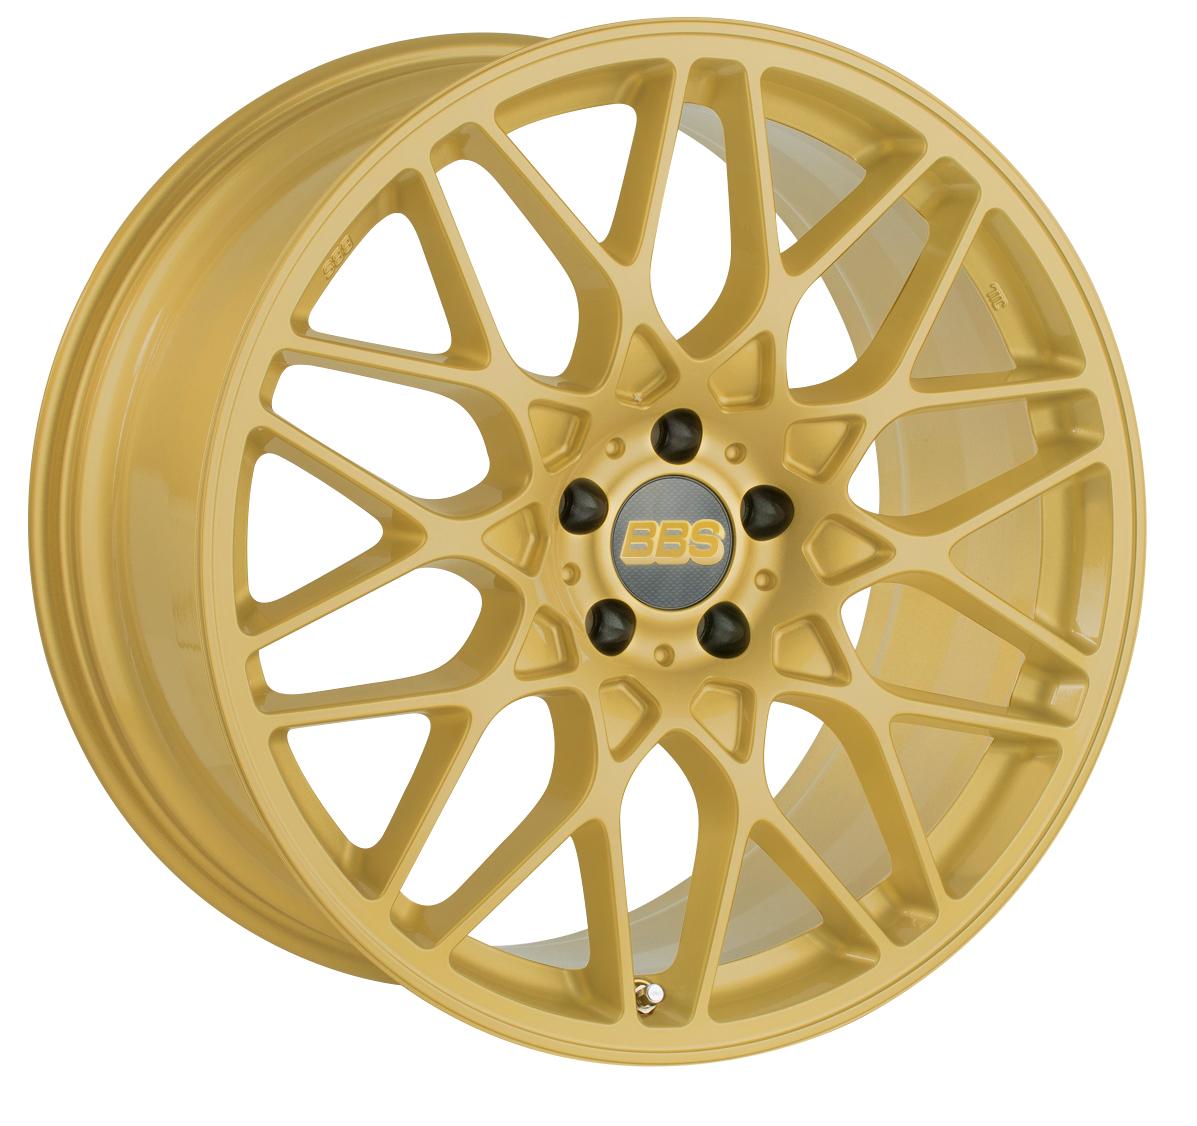 BBS Announces RX-R Gold Racing Rims- Eurotuner